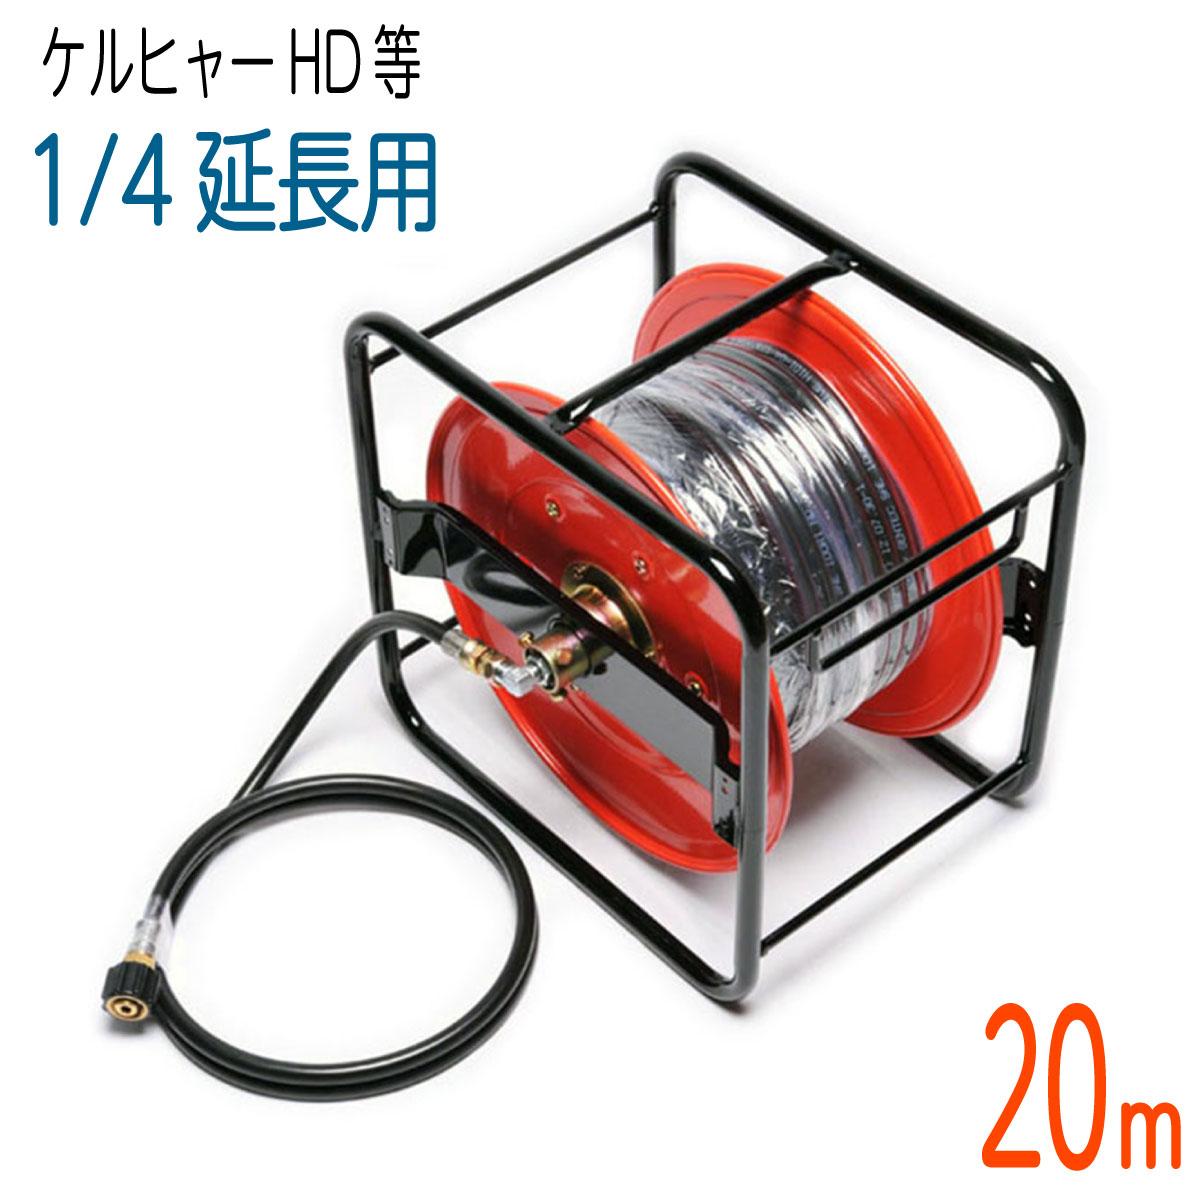 【20Mリール巻き】旧式 ケルヒャーHD用 延長高圧洗浄機ホース コンパクトホース